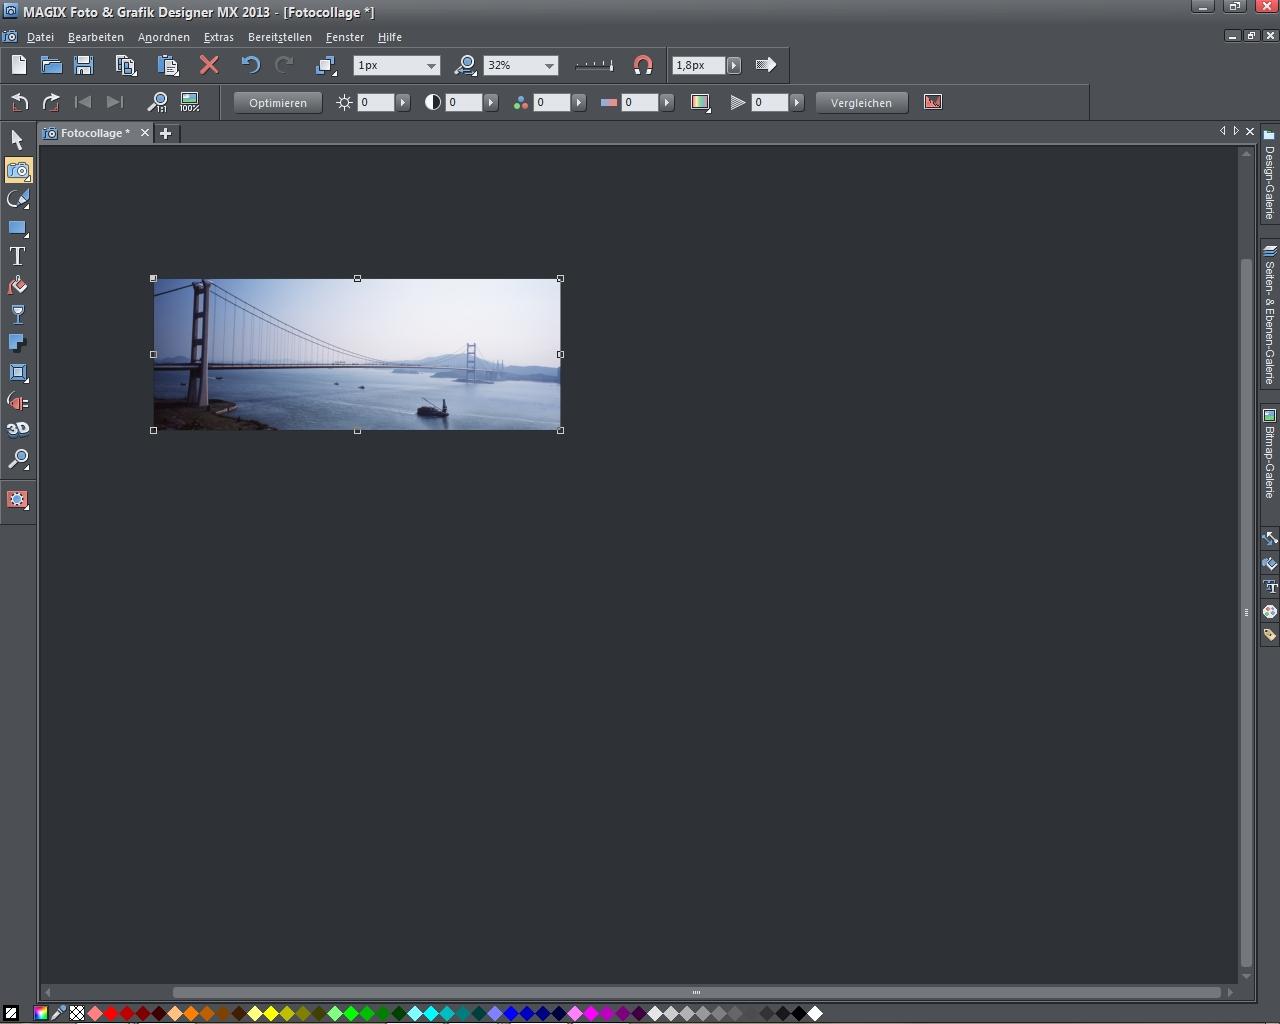 MAGIX Foto & Grafik Designer 2013 Screenshot